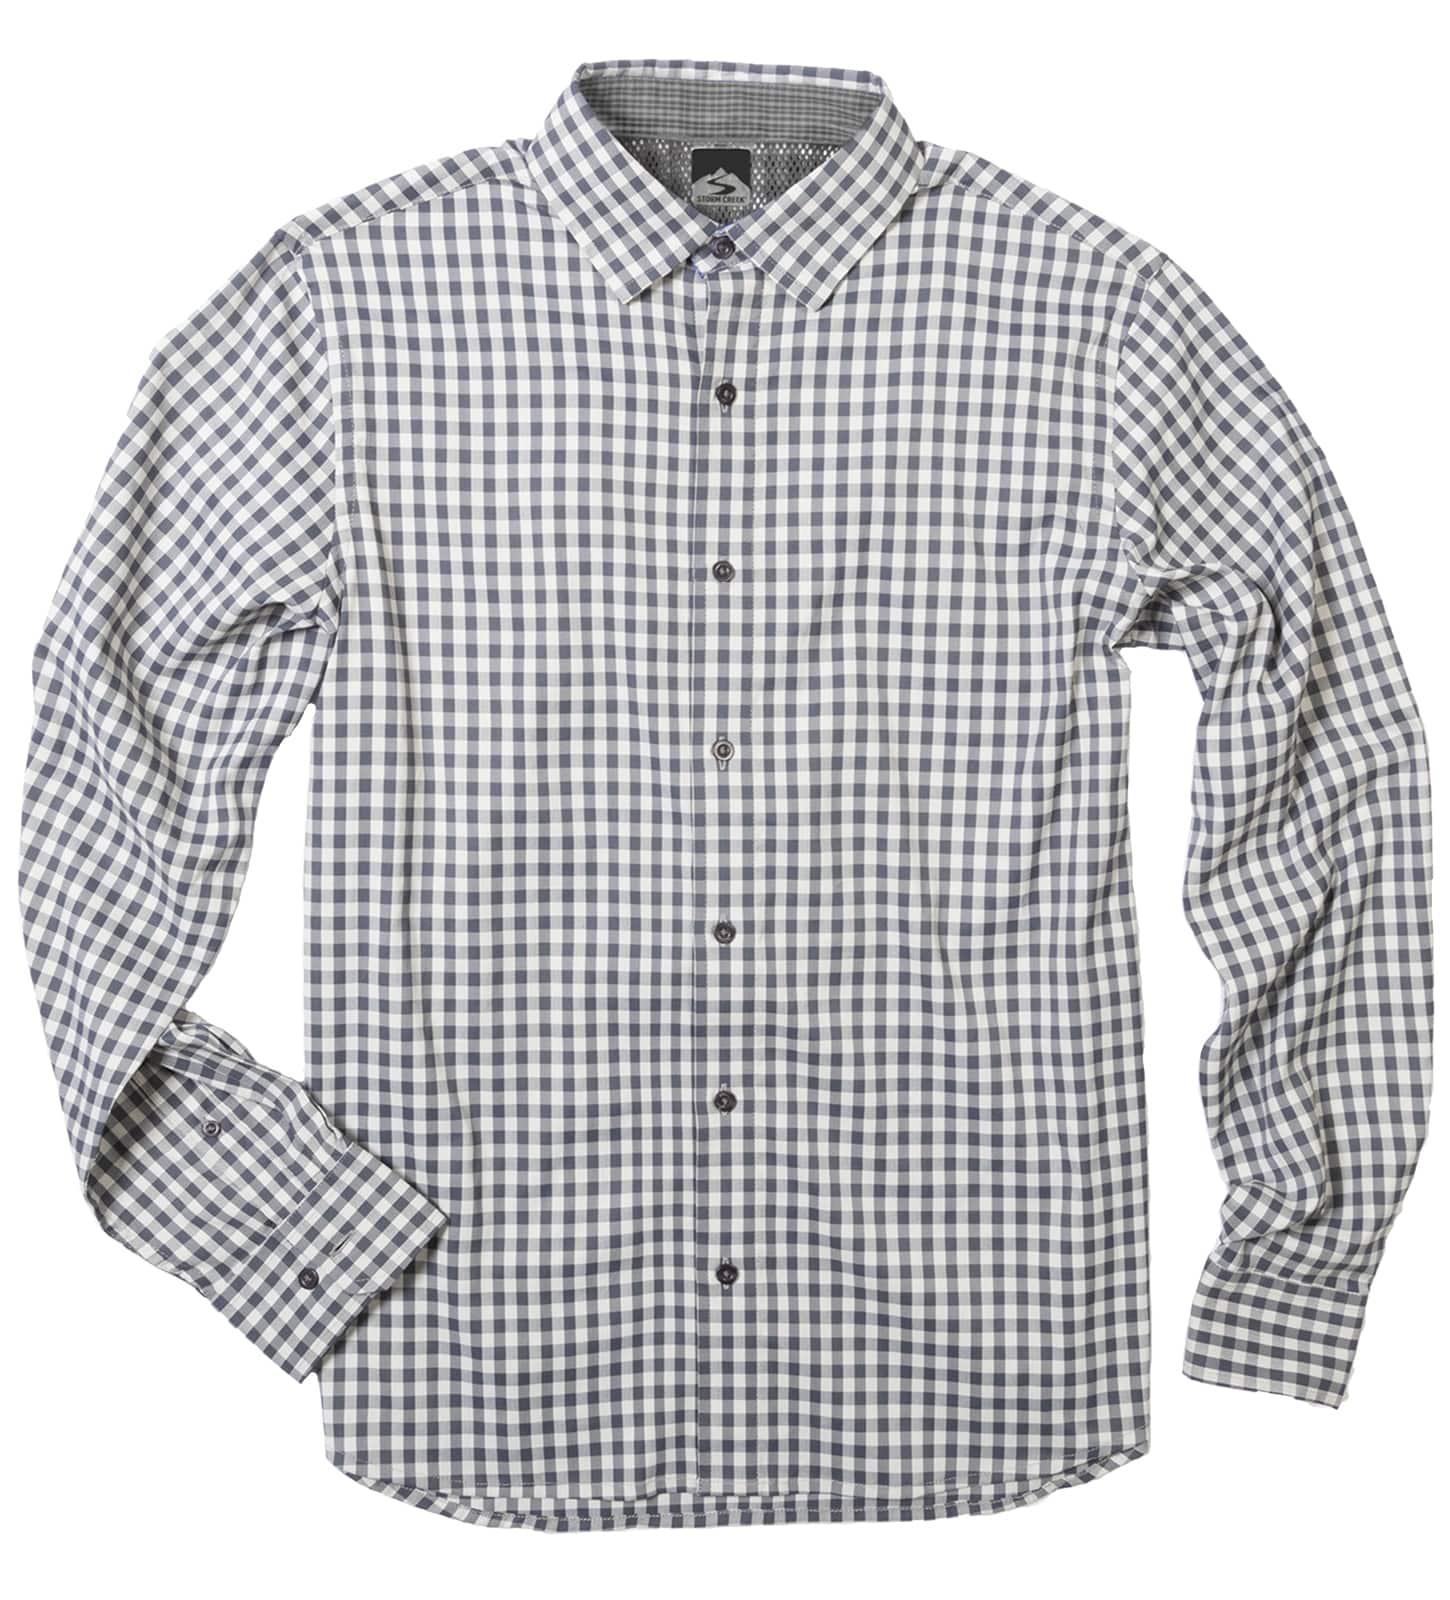 Storm Creek 2570 - Men's Gingham 4-Way Stretch Eco-Woven Shirt